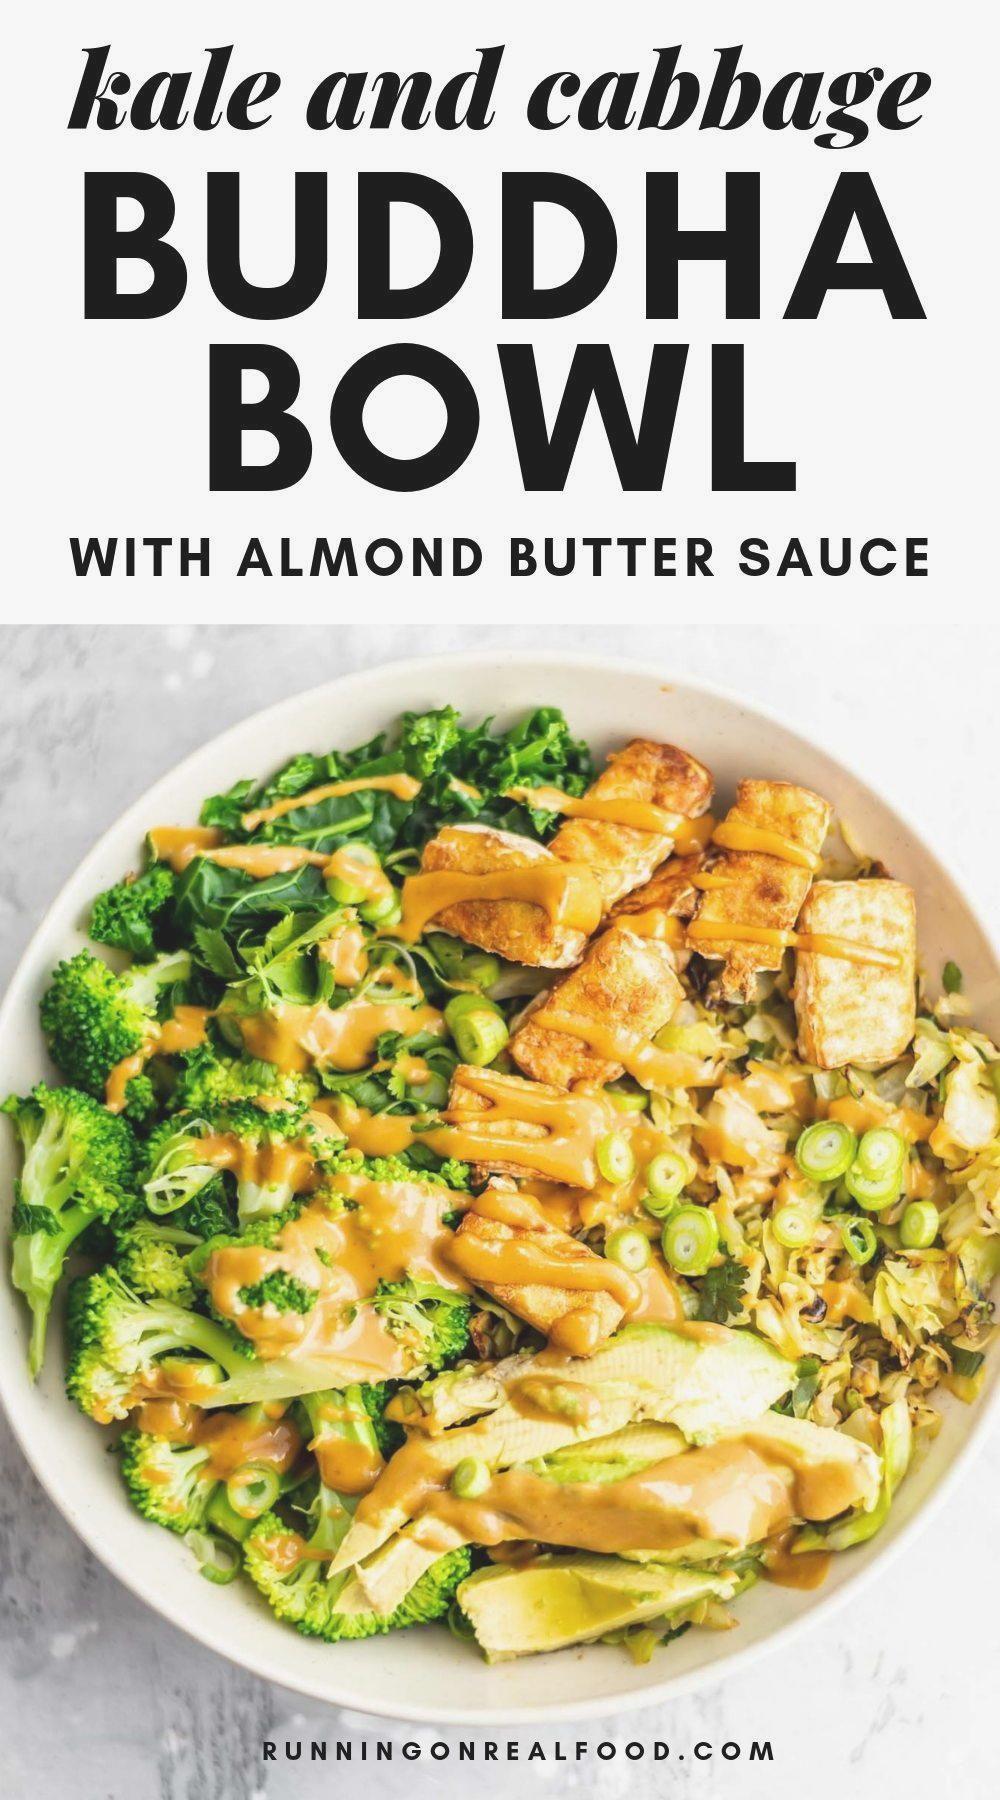 Low Carb Vegan Dinner Bowl Recipe Running On Real Food In 2020 Rezepte Gesunde Rezepte Hauptmahlzeit